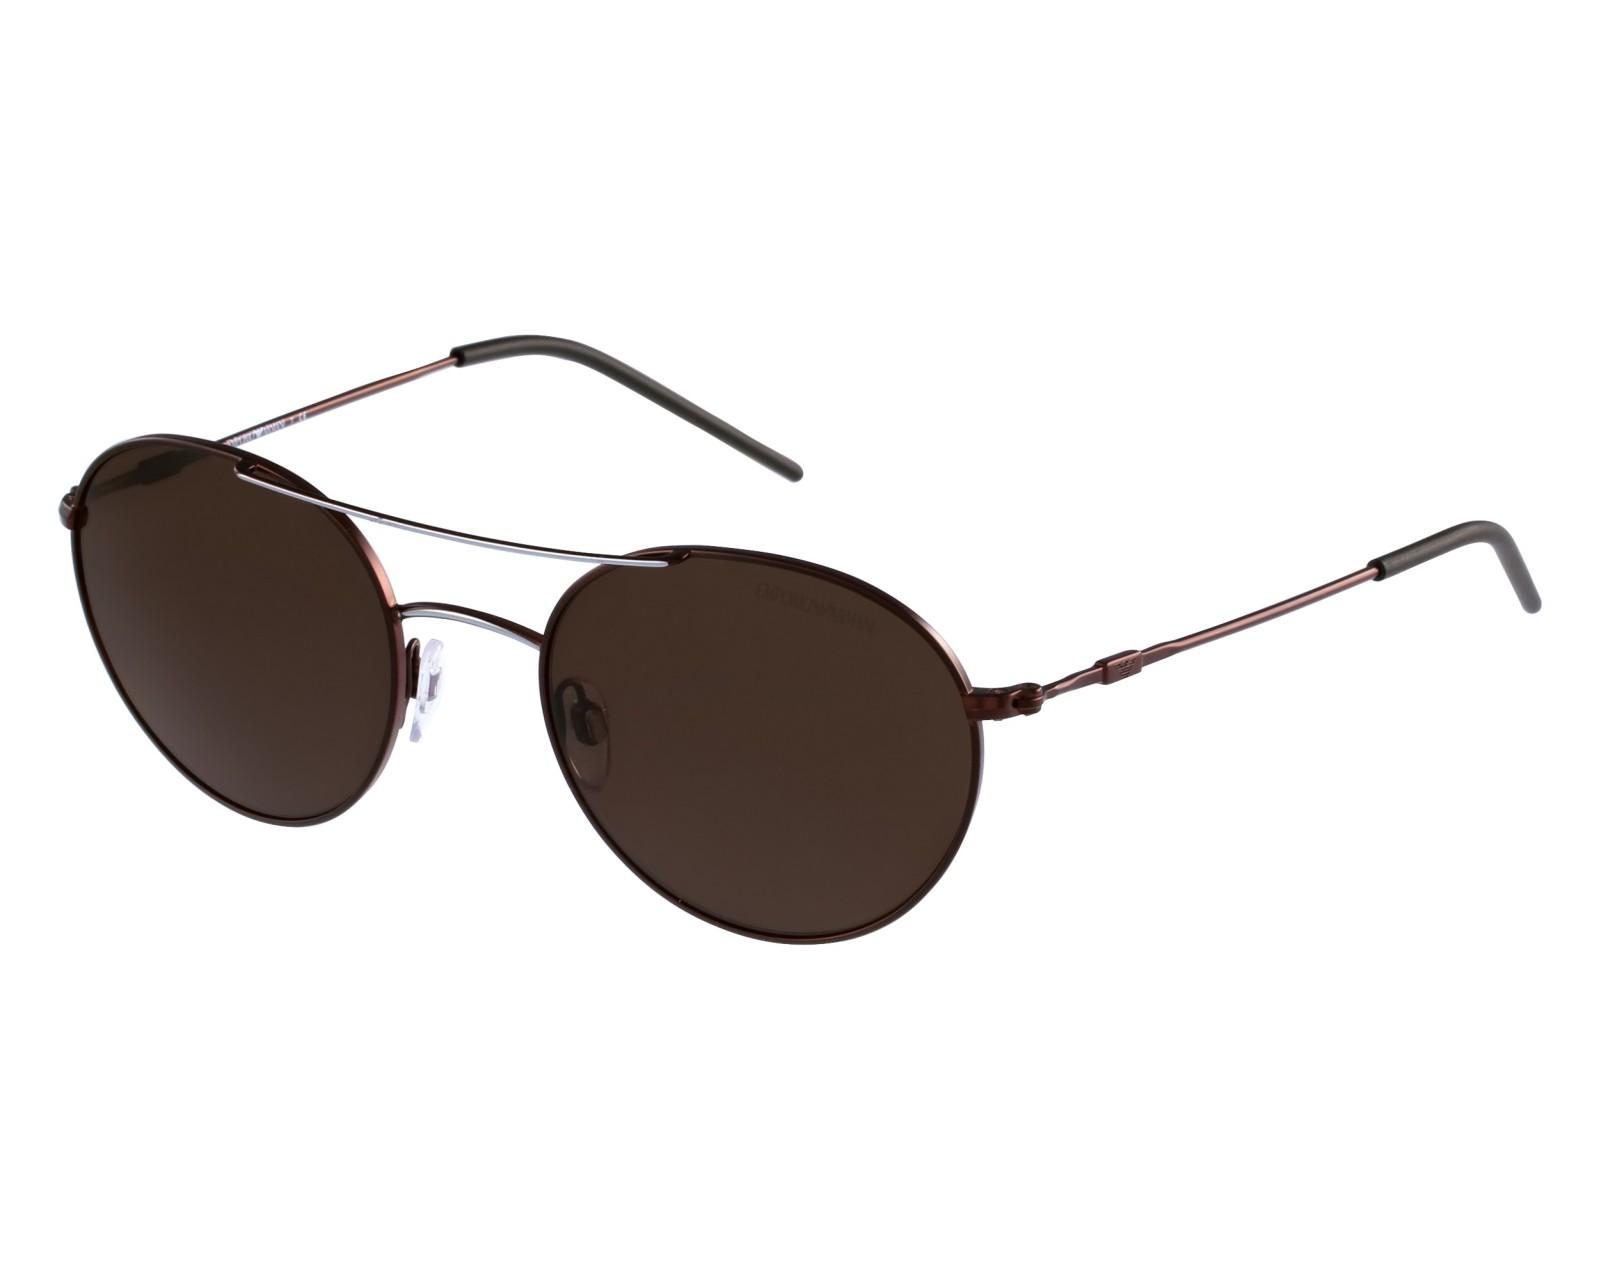 Emporio Armani EA2026 Sonnenbrille Schwarz 308273 52mm yGCLh6rcyL